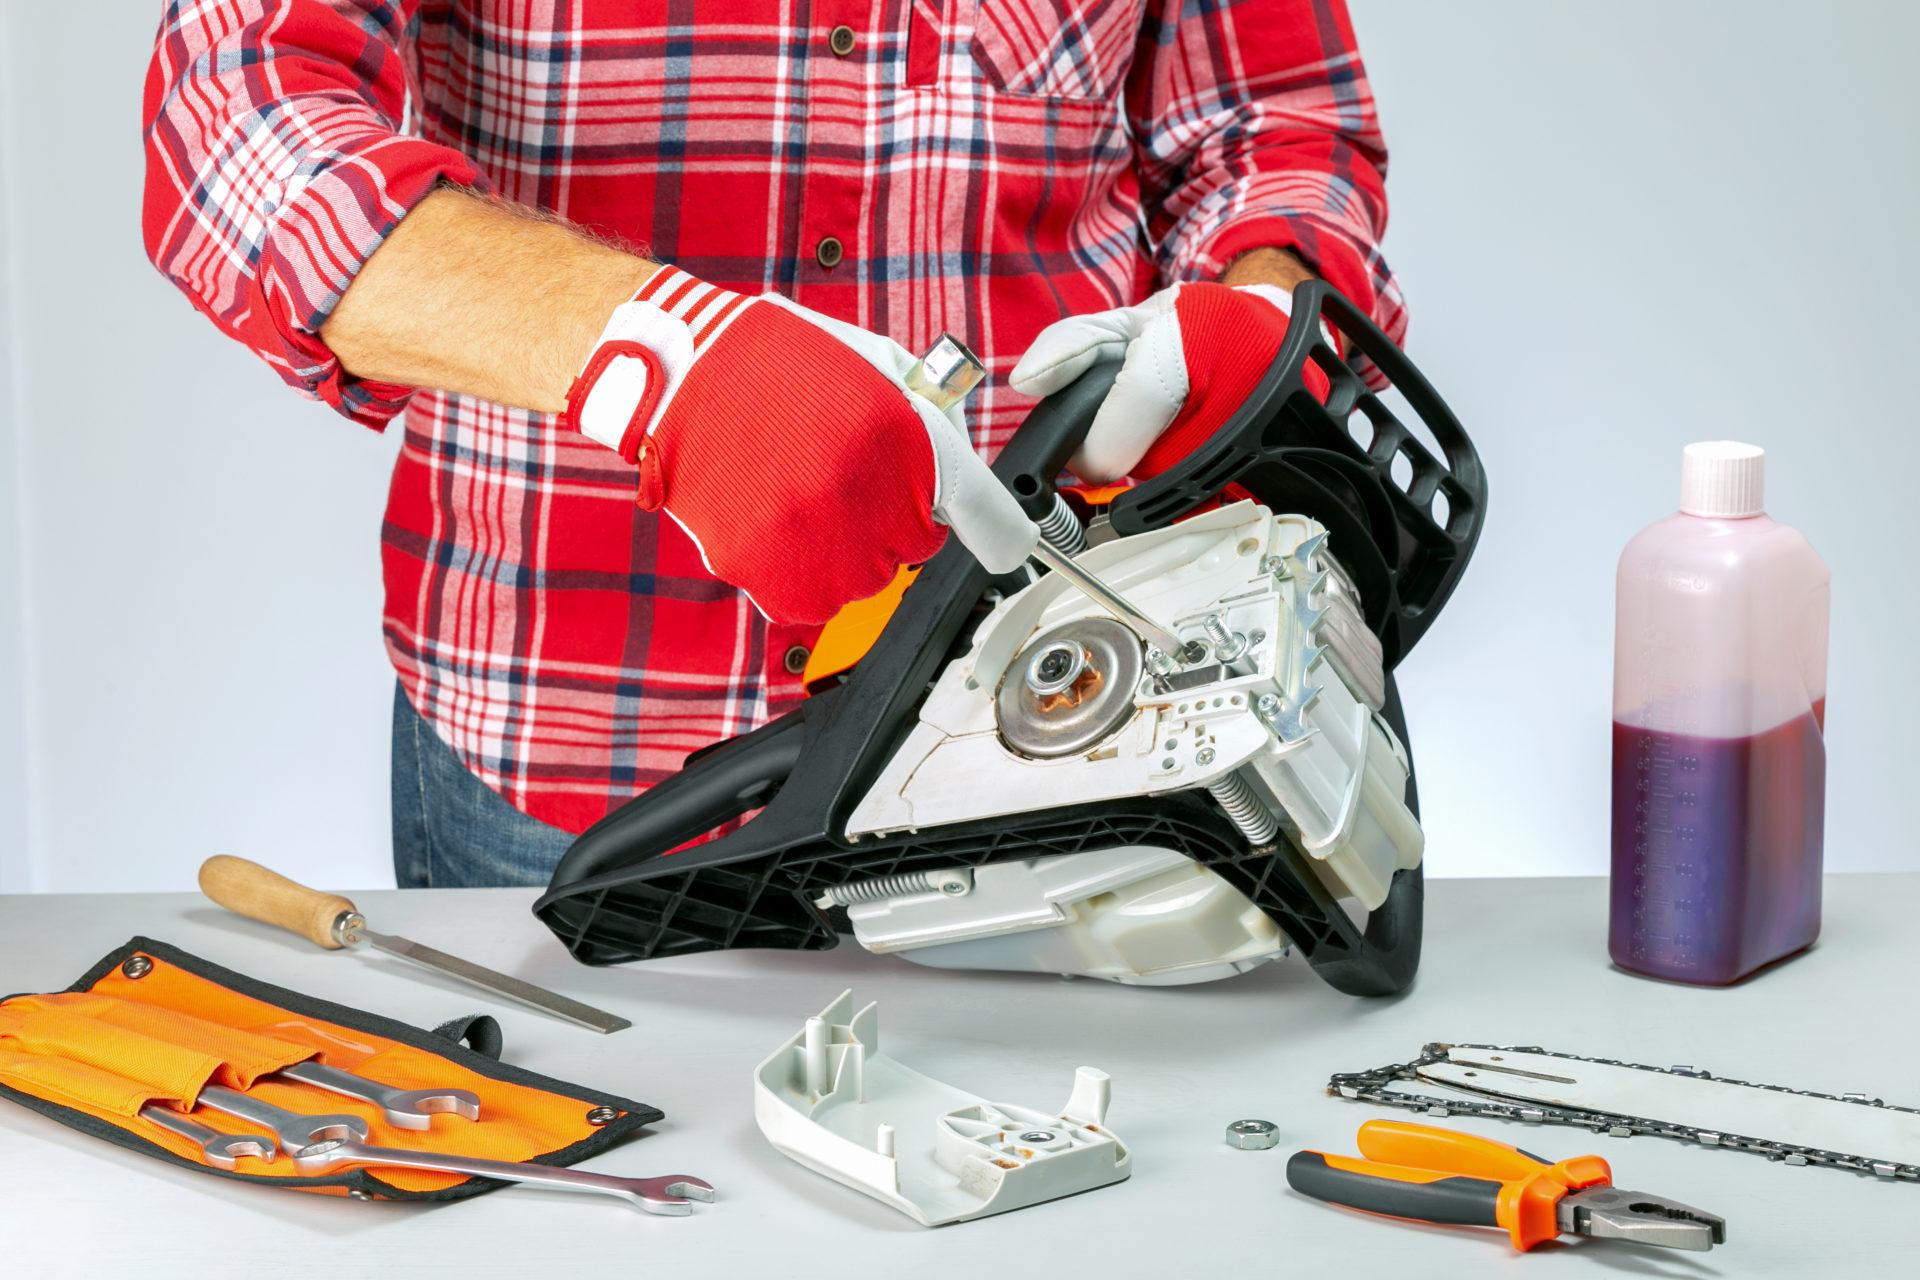 Serviceman,Is,Repairing,A,Chainsaw,In,Repair,Shop.,Repair,And